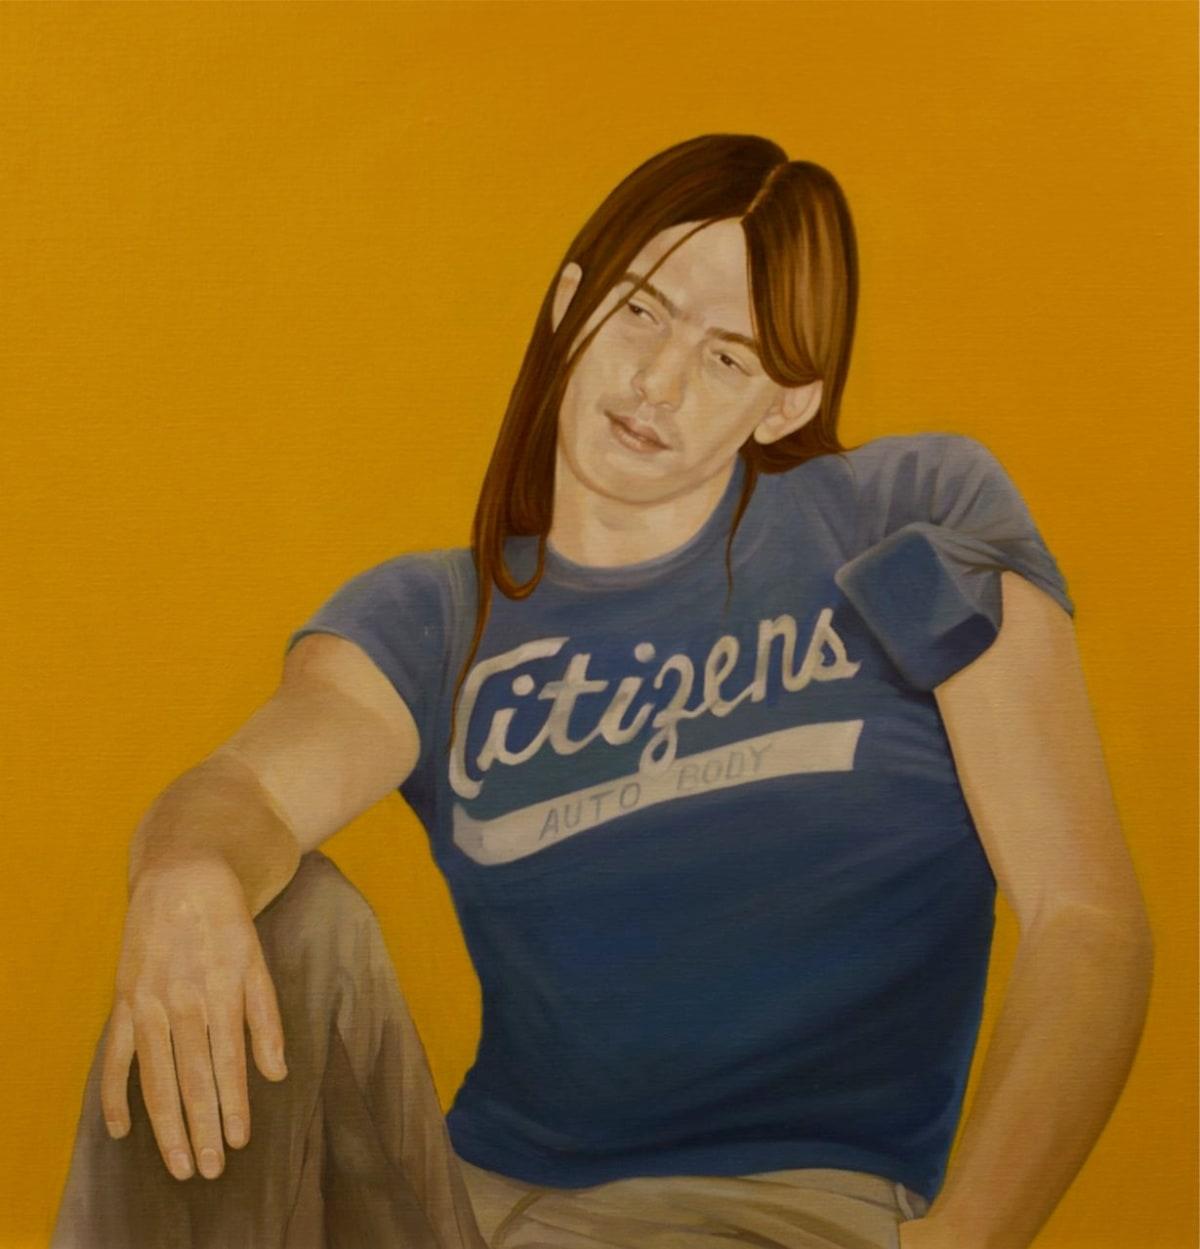 Grace O'Connor Union City Road, 2009 Oil on Linen 61 x 55.9 cm 24 x 22 in